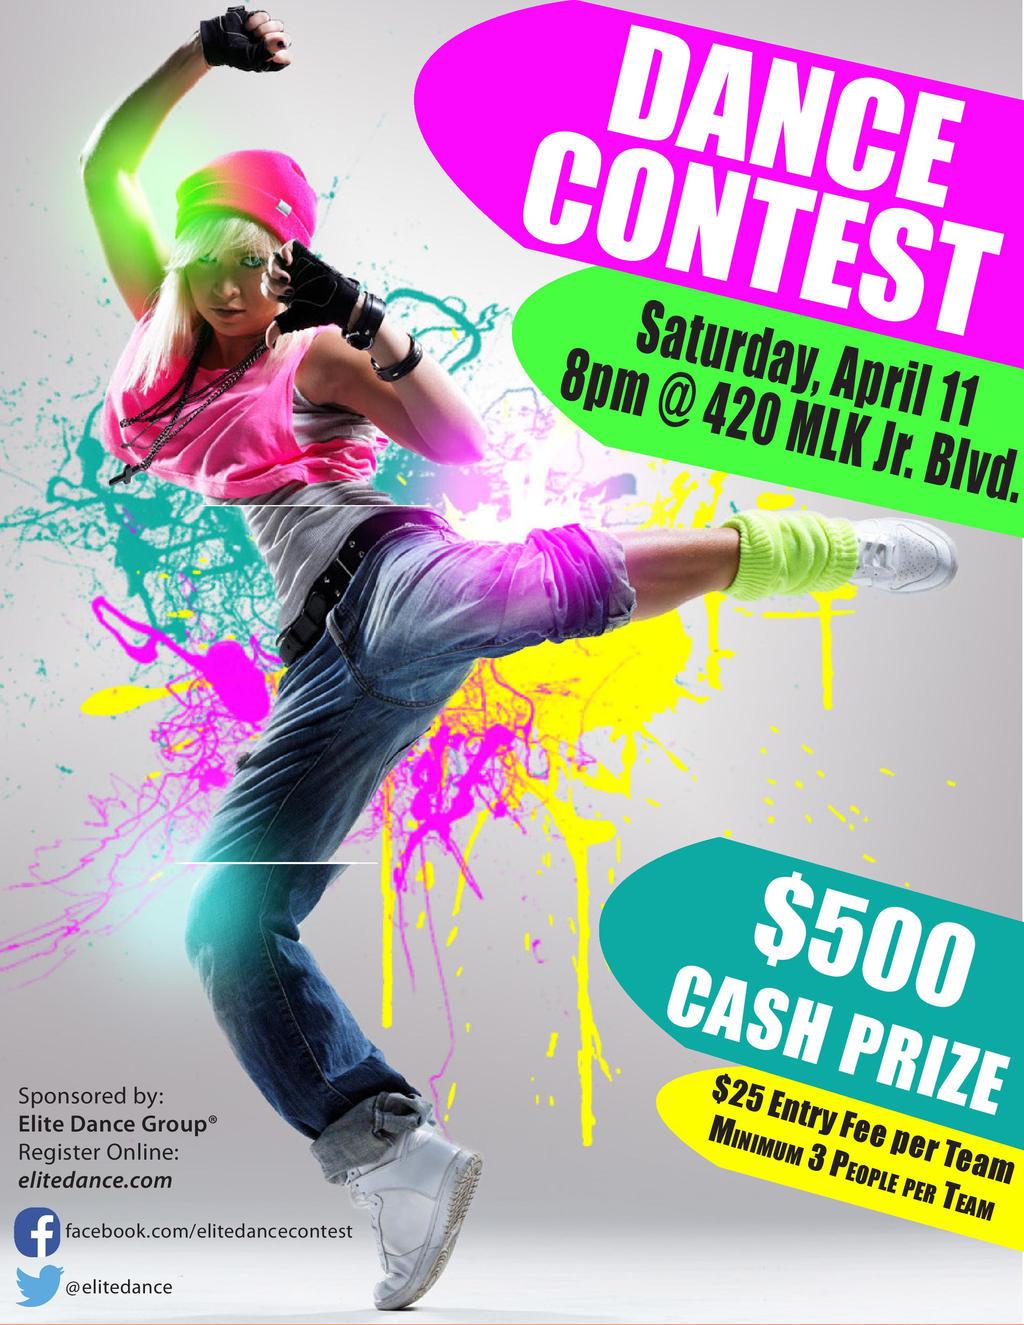 Dance Contest Flyer Idea By Cupycake66 On Deviantart